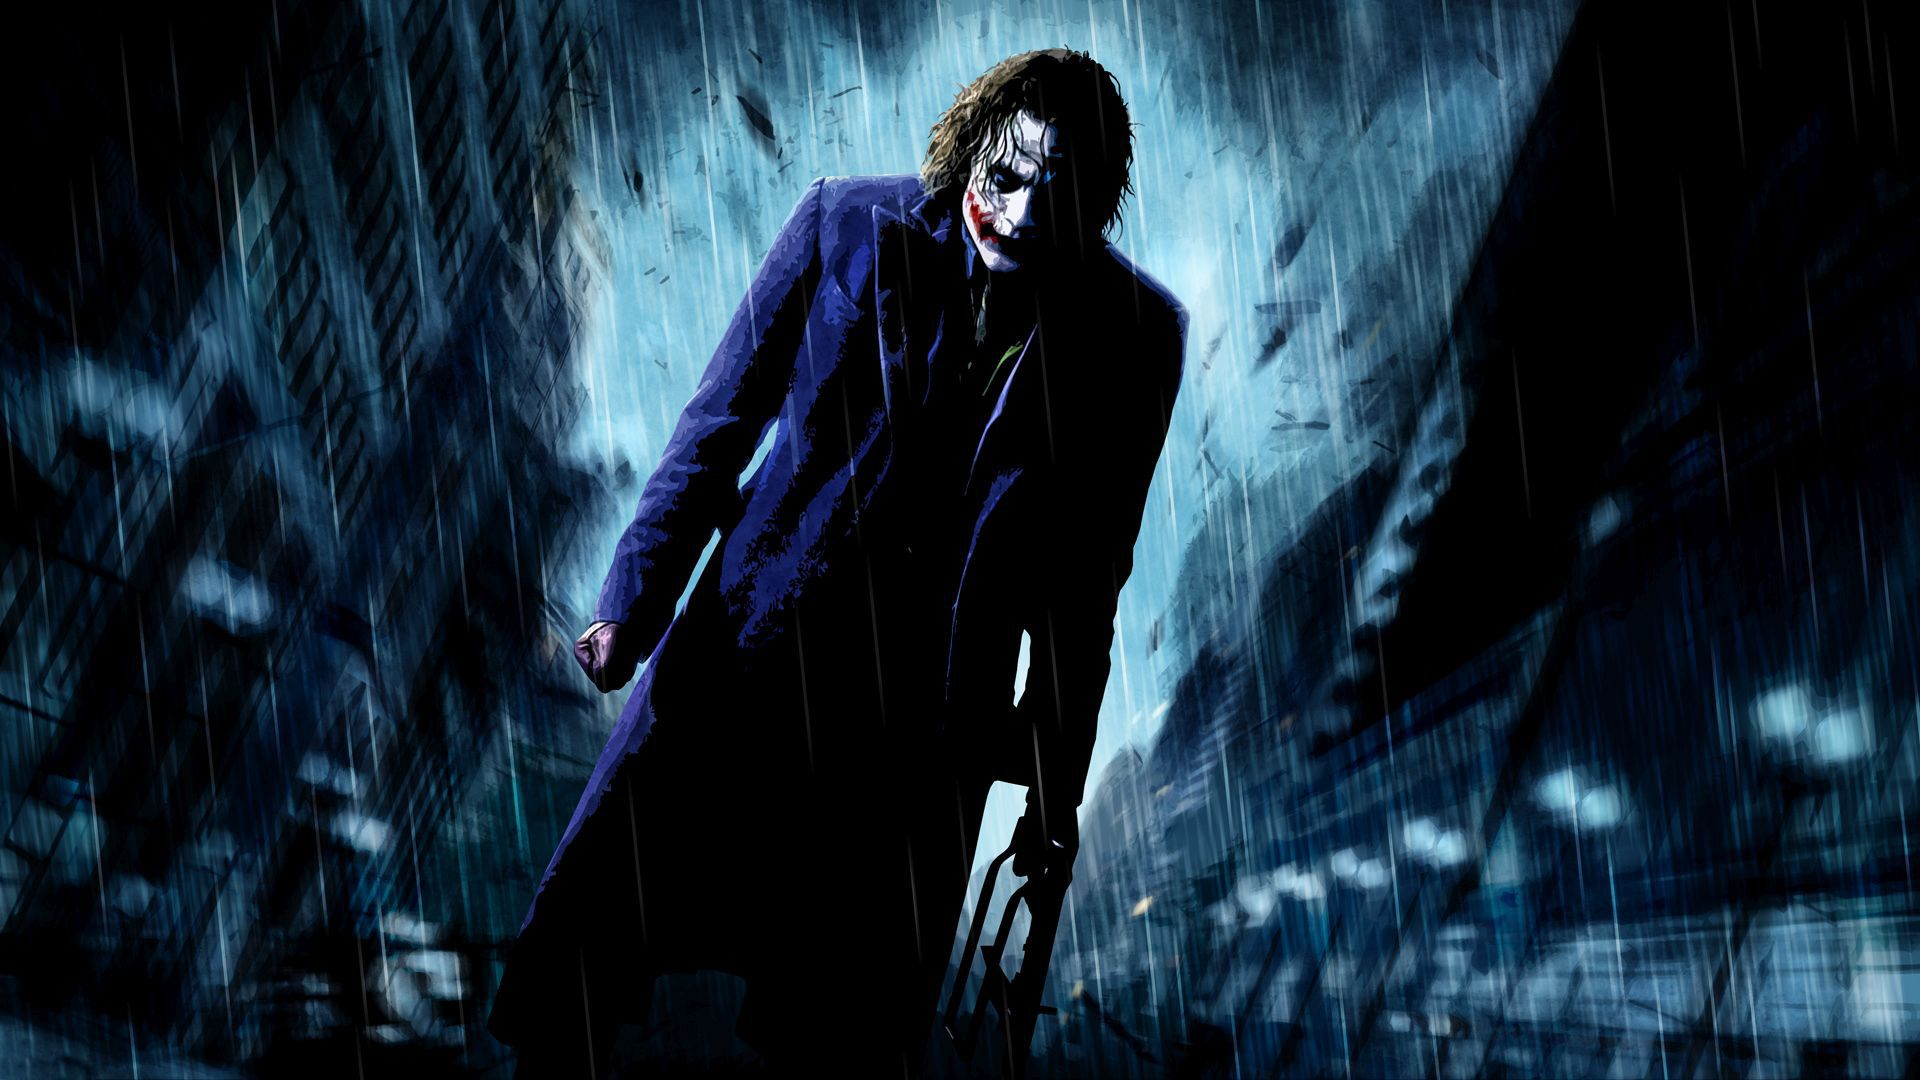 Wallpaper download joker - The Joker Heath Ledger Wallpapers Group